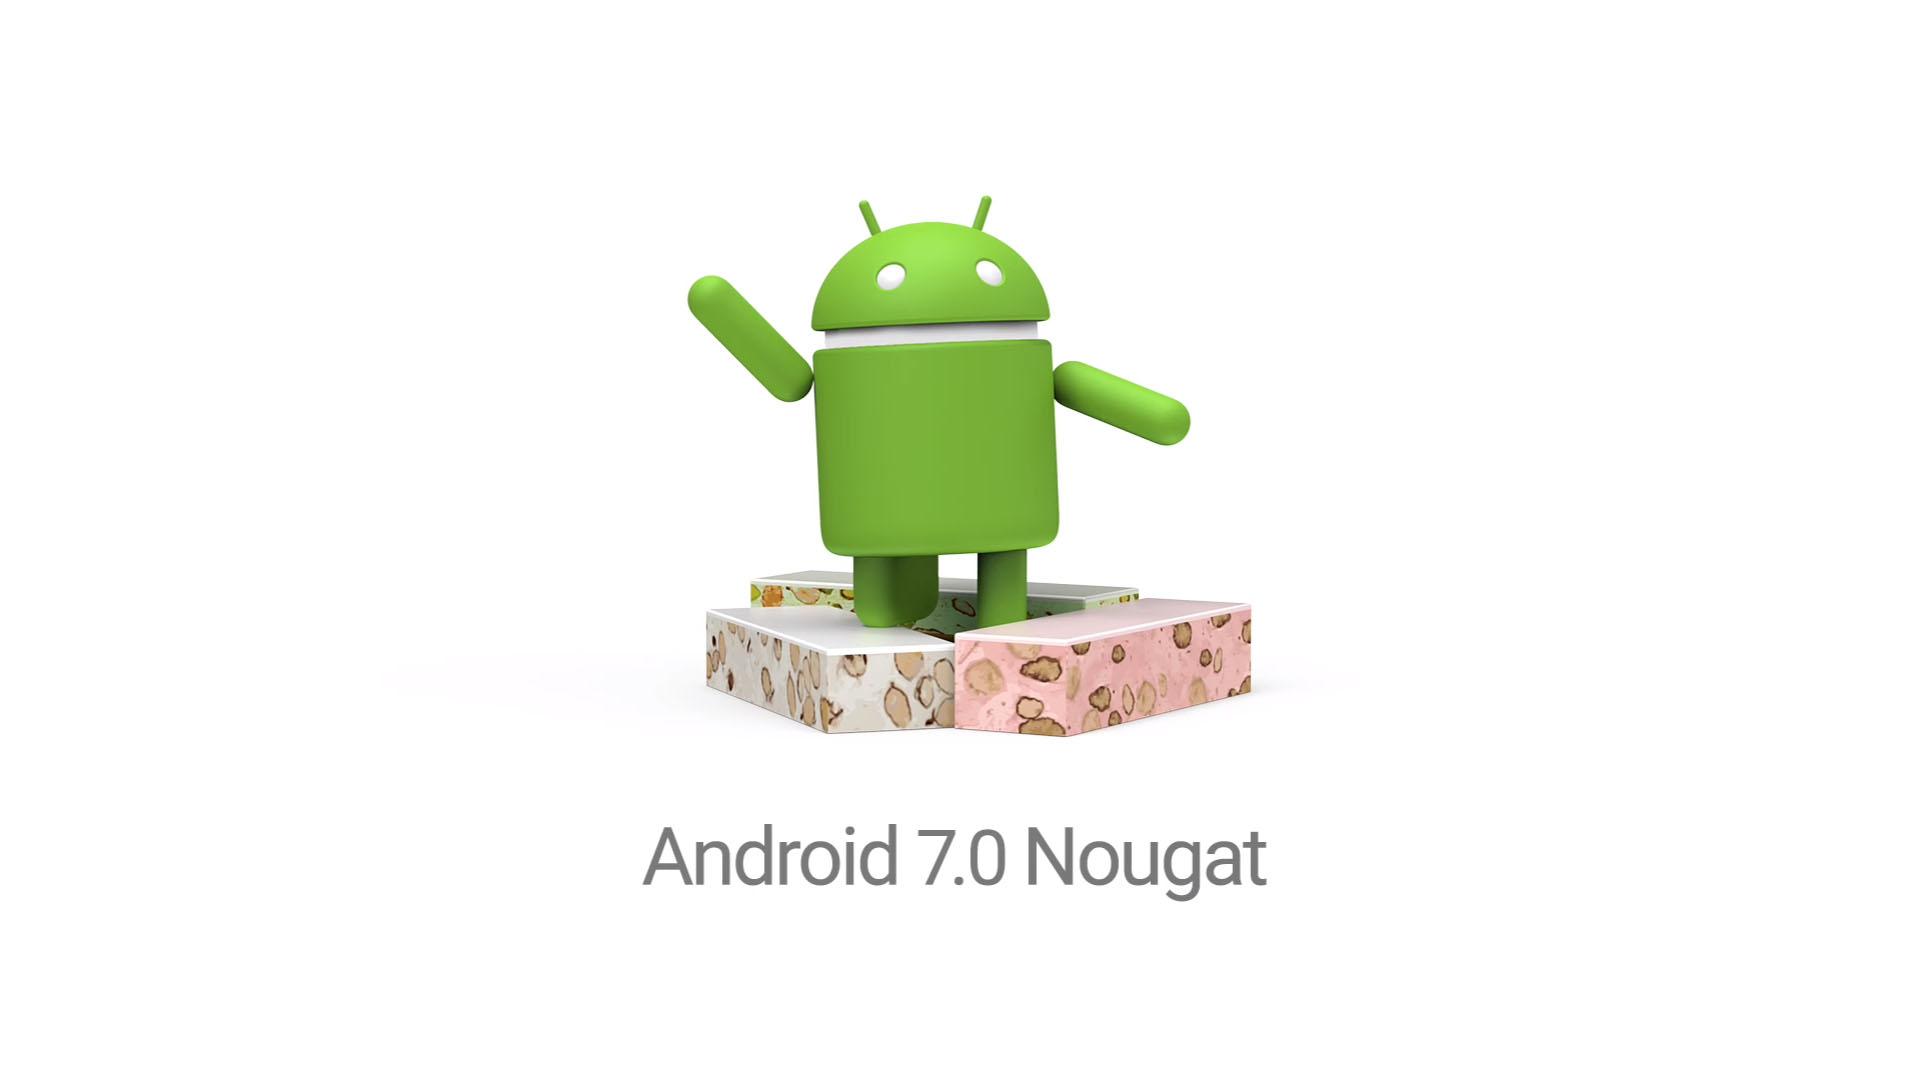 Les Lenovo Moto G4 et Moto G4 Plus reçoivent Android 7.0 Nougat